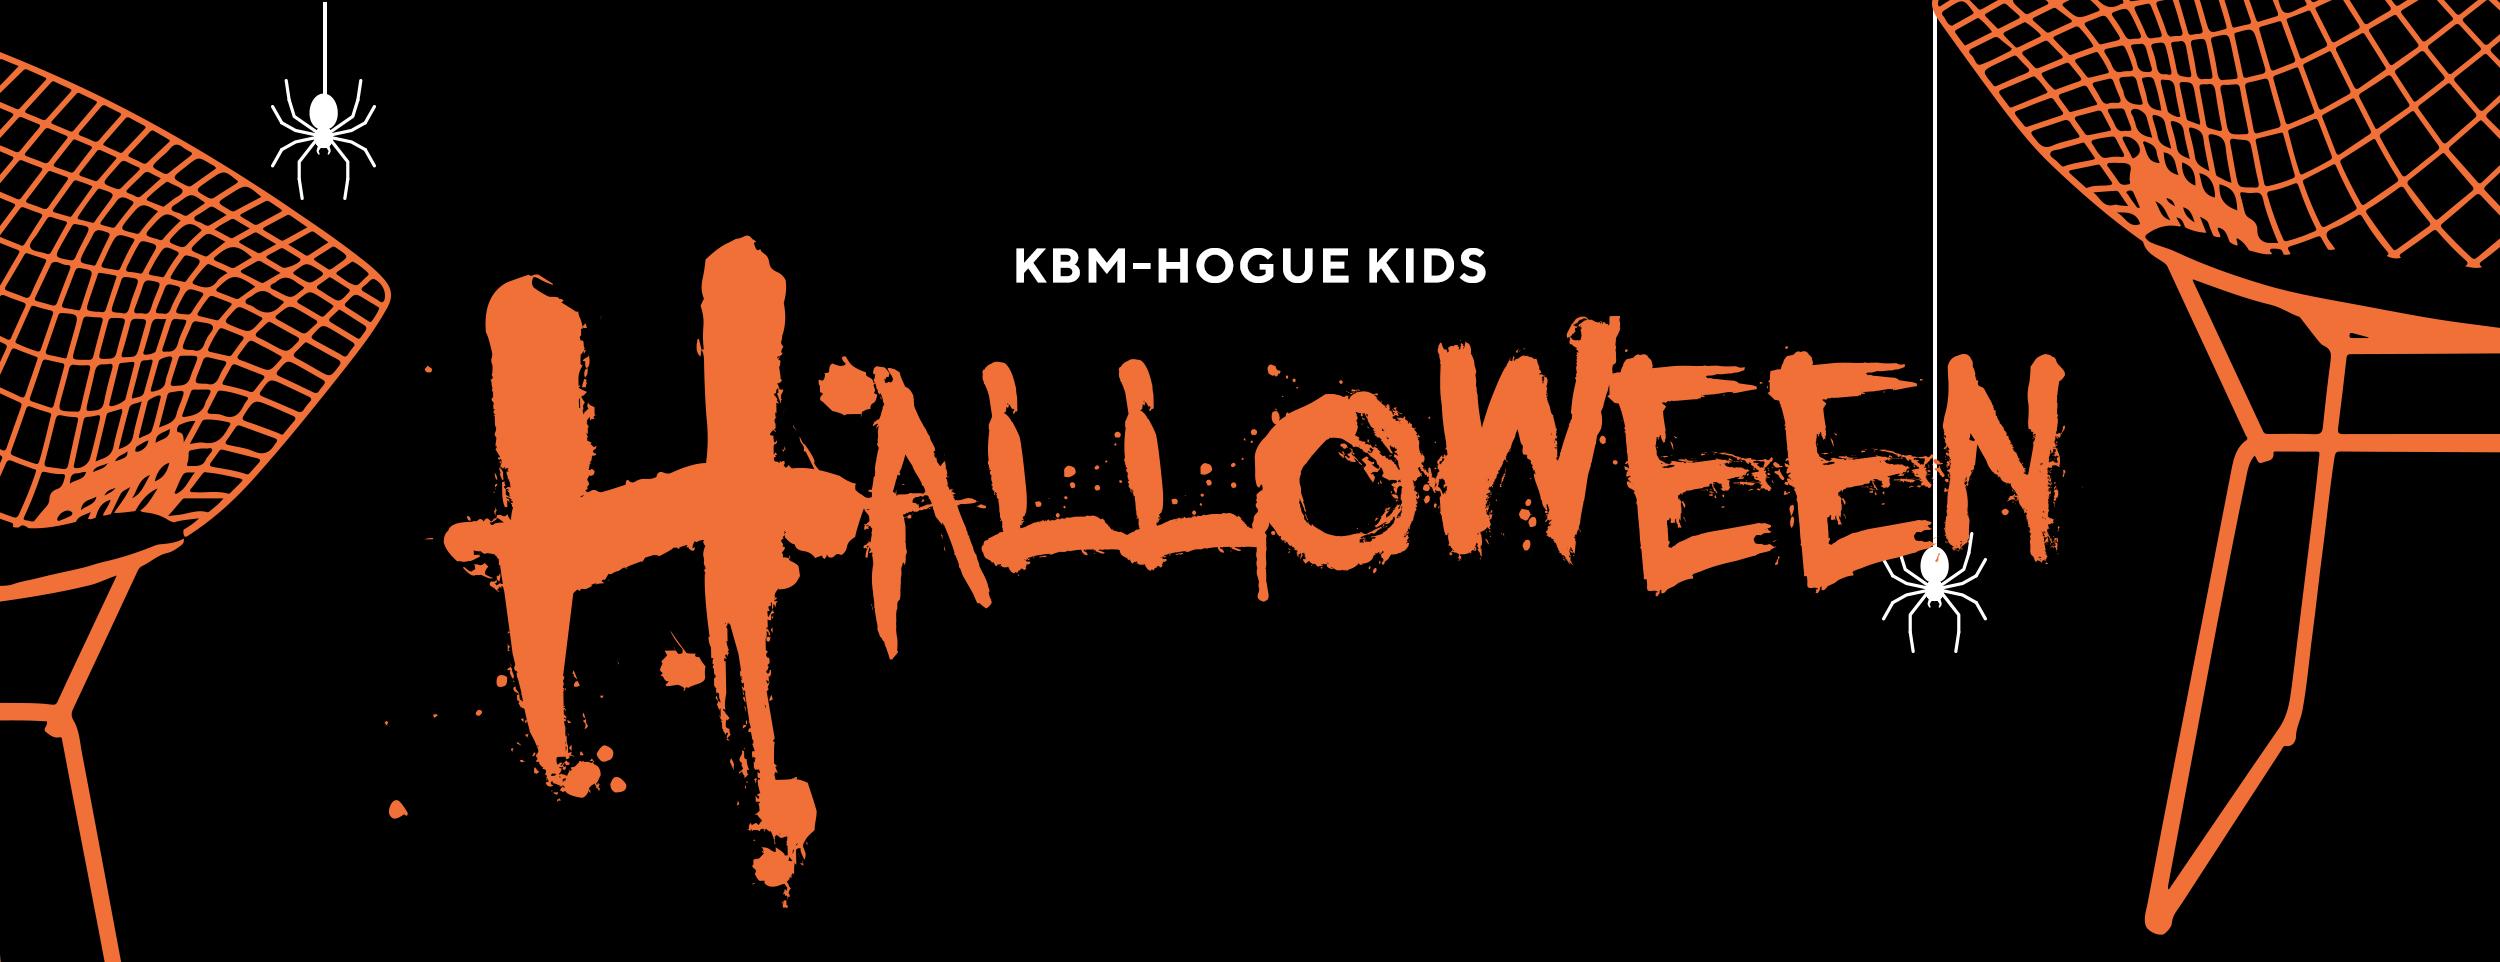 HalloweenKidsHeader.jpg